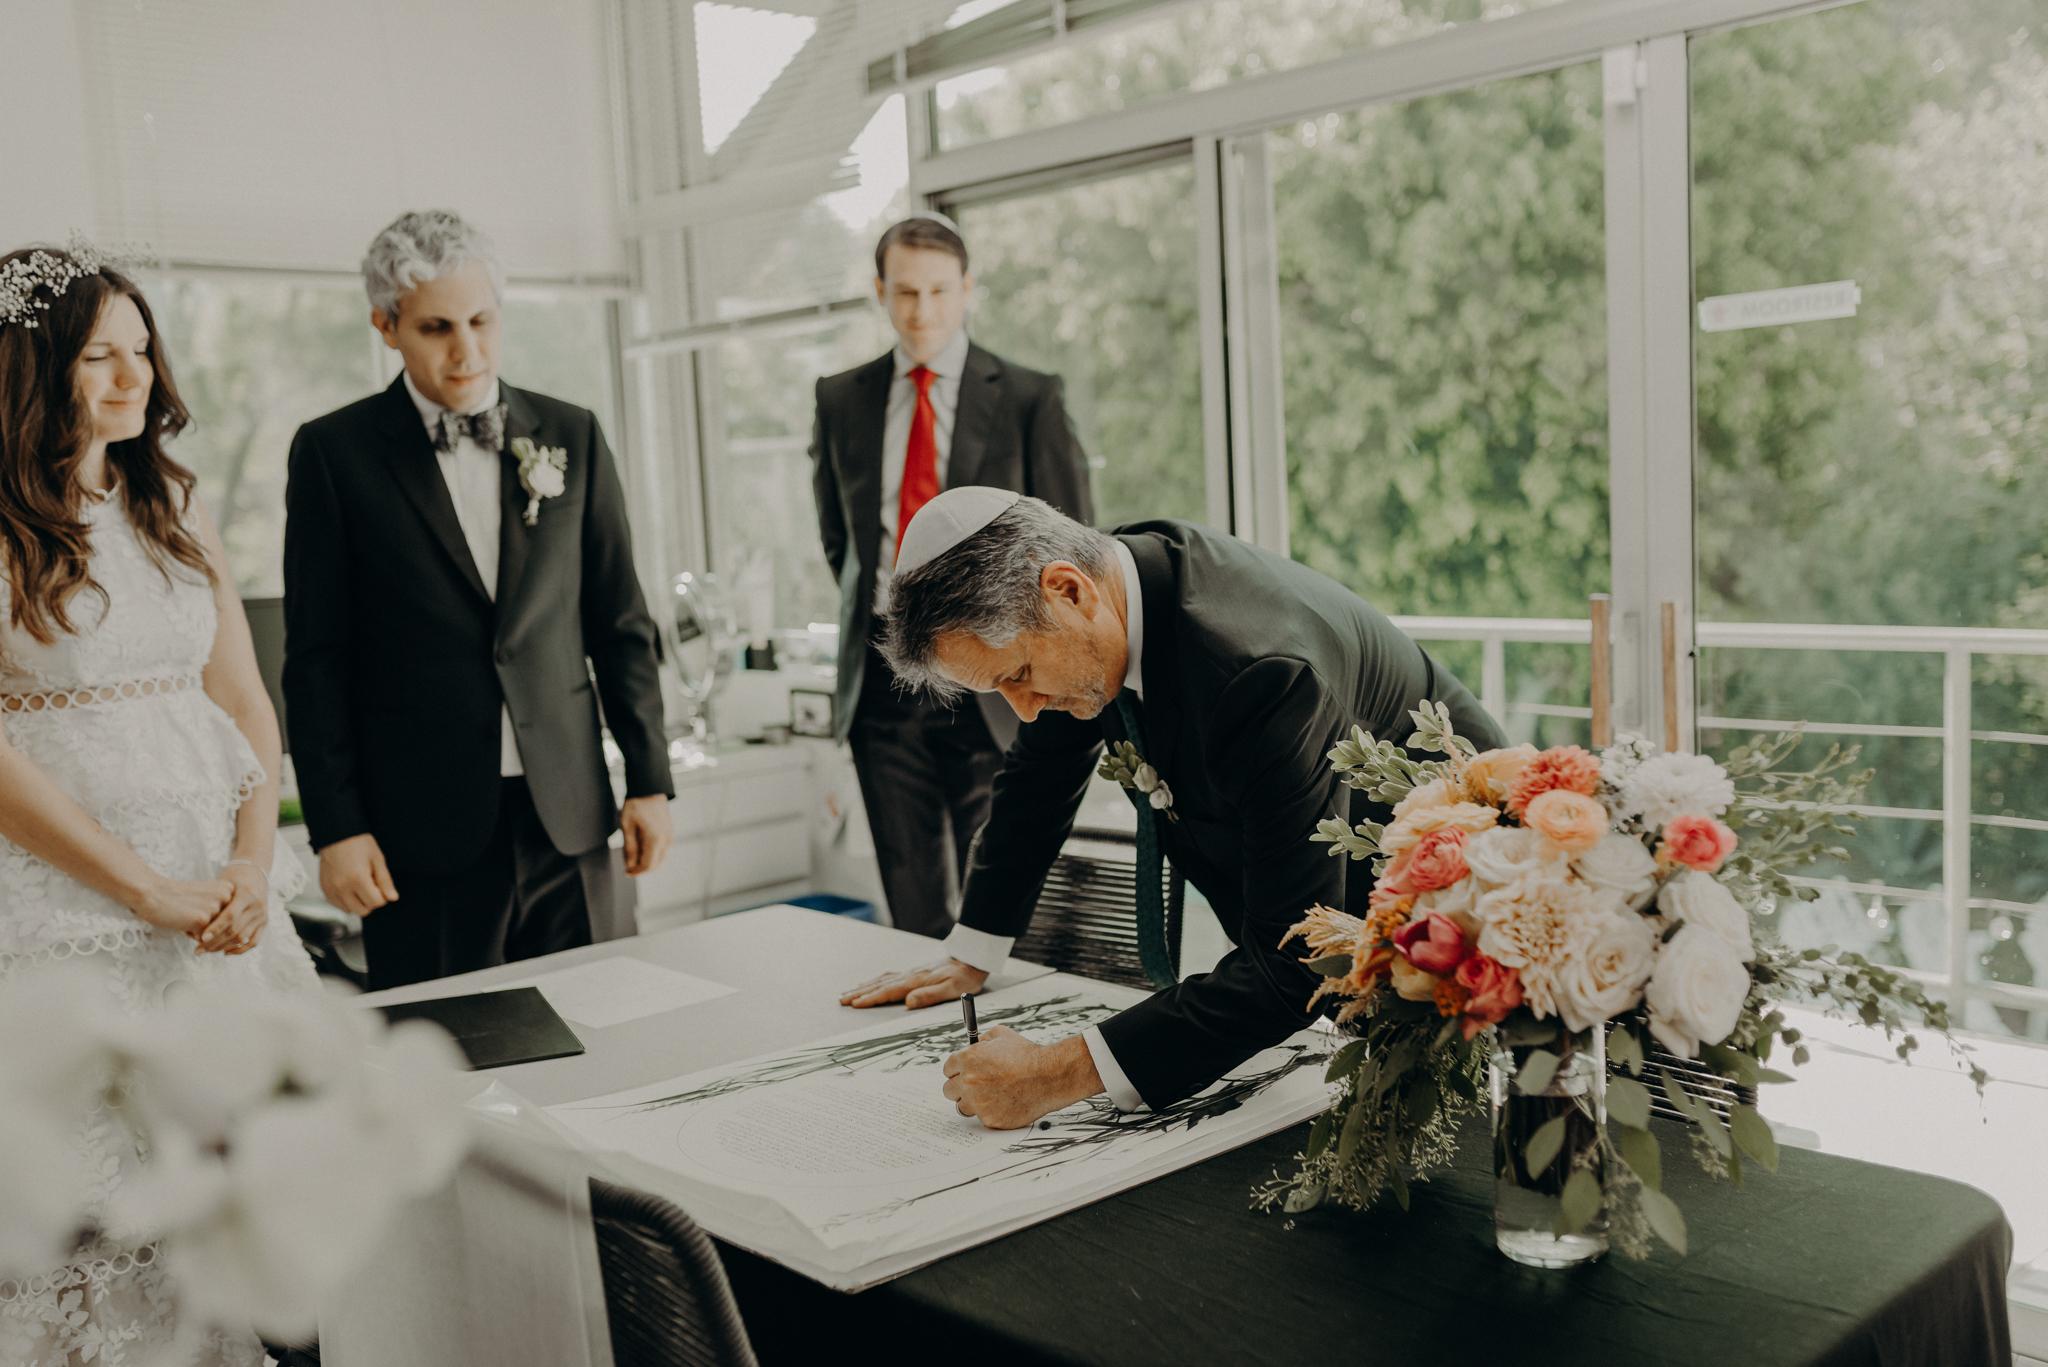 Isaiah + Taylor Photography - Private Estate Backyard Wedding - Beverly Hills - Los Angeles Wedding Photographer - 55.jpg